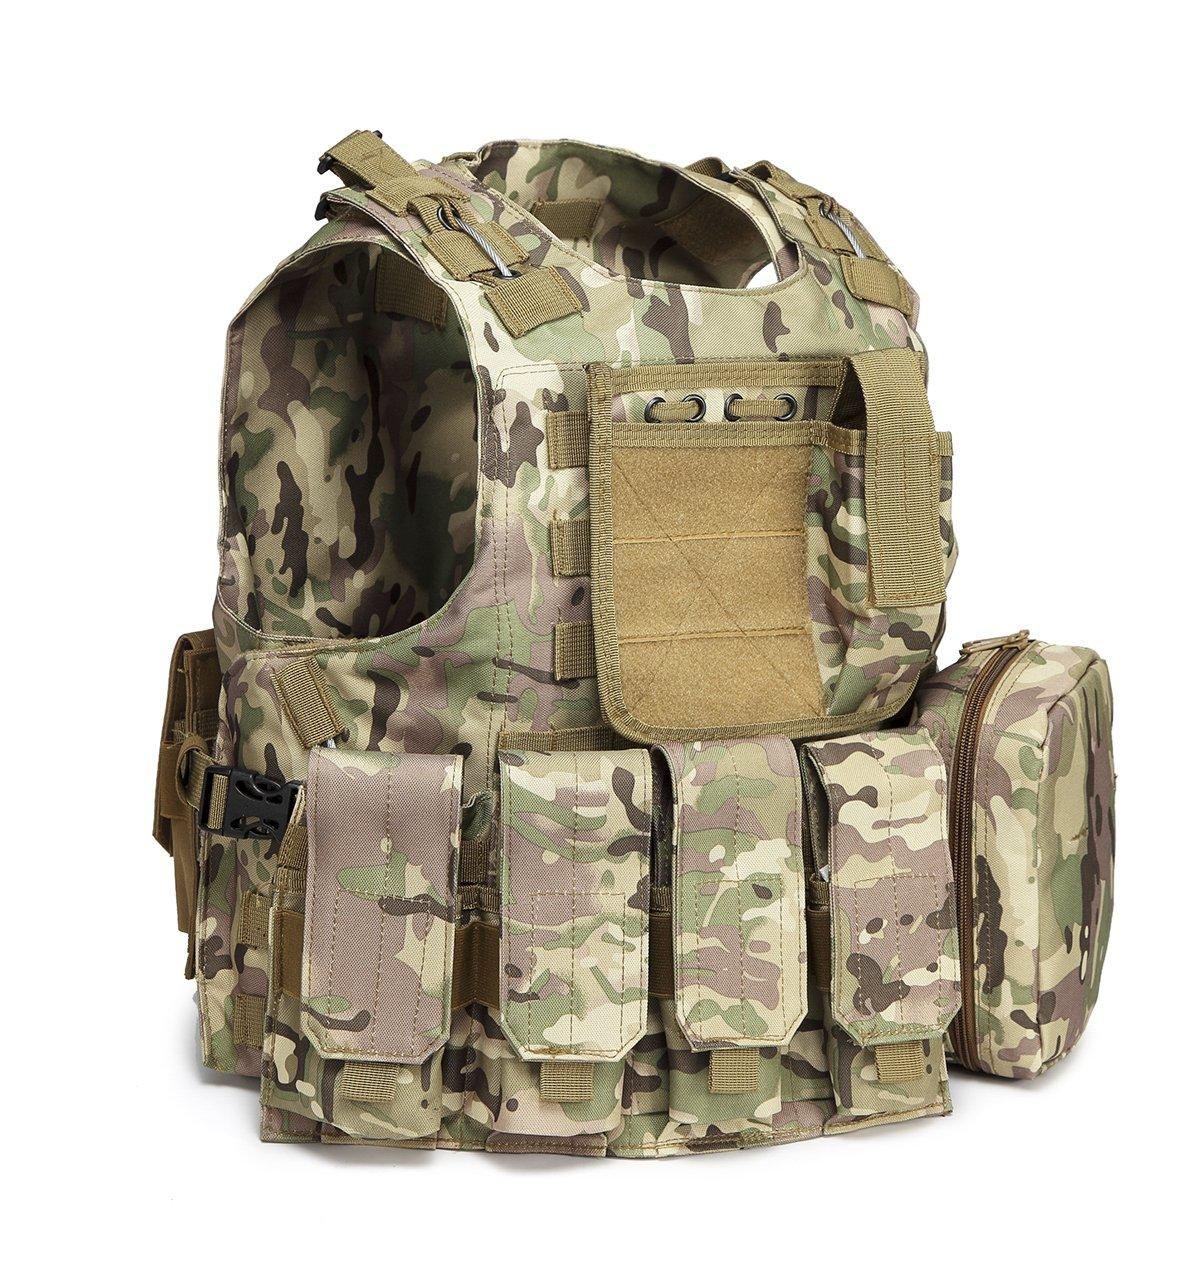 Gharpbik Tactical Vest Training Airsoft CS Vest Molle Camouflage Ultra-light Breathable Adjustable Combat Military